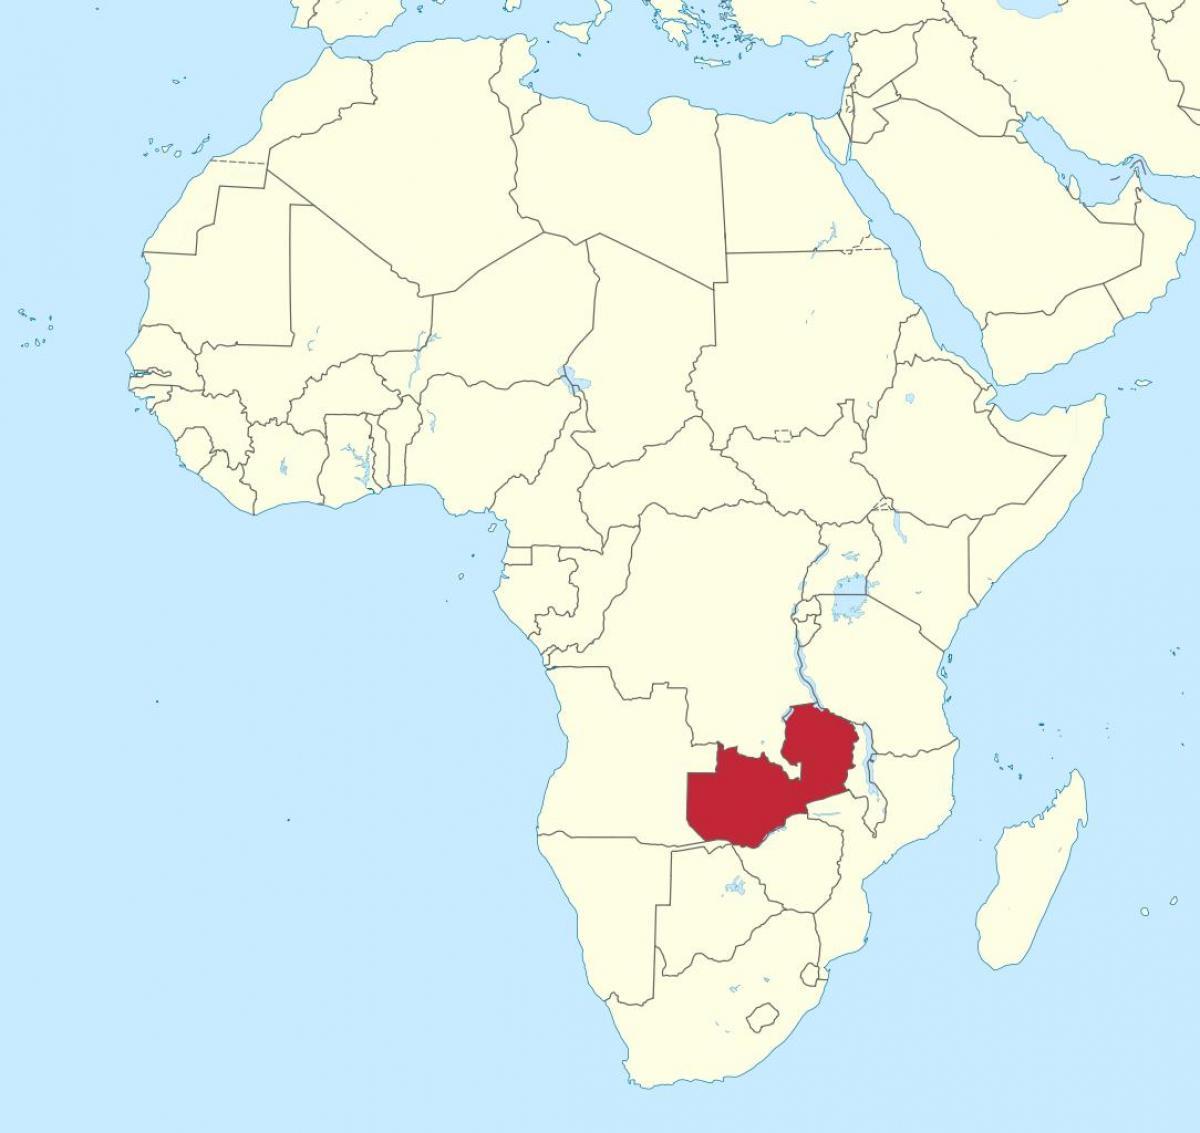 Map Of Africa Zambia.Zambia Africa Map Map Of Africa Showing Zambia Eastern Africa